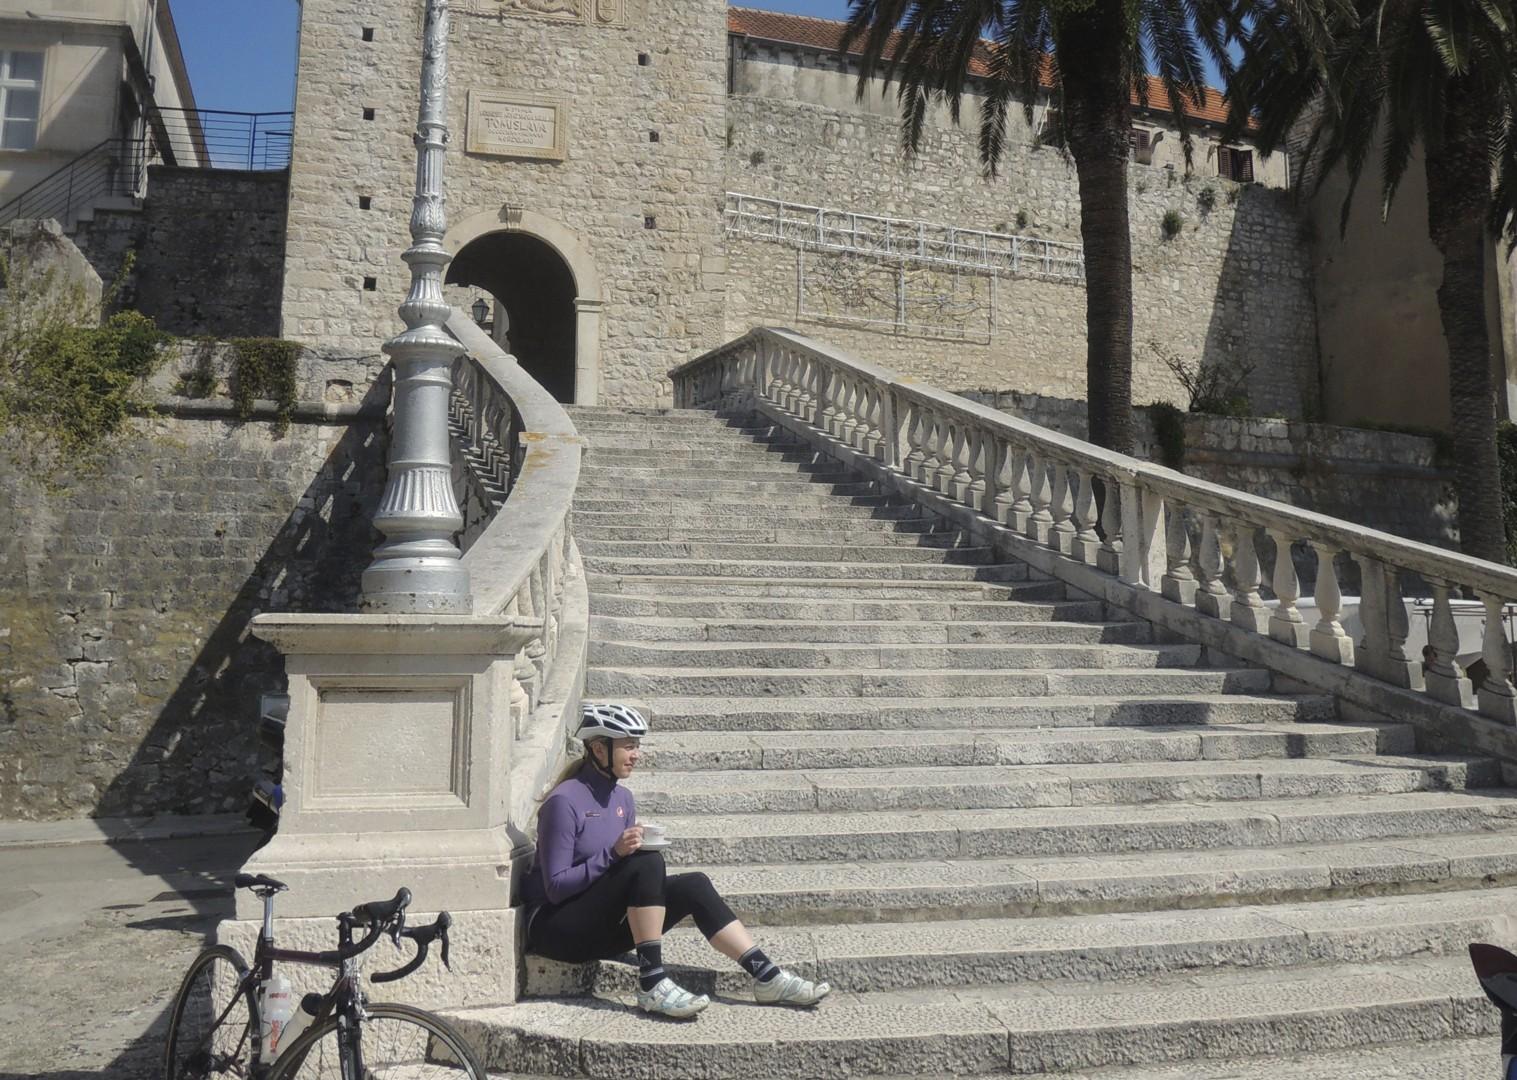 croatiaroad3.jpg - Slovenia and Croatia - Slovenian Alps to Dalmatian Coast - Guided Road Cycling Holiday - Road Cycling